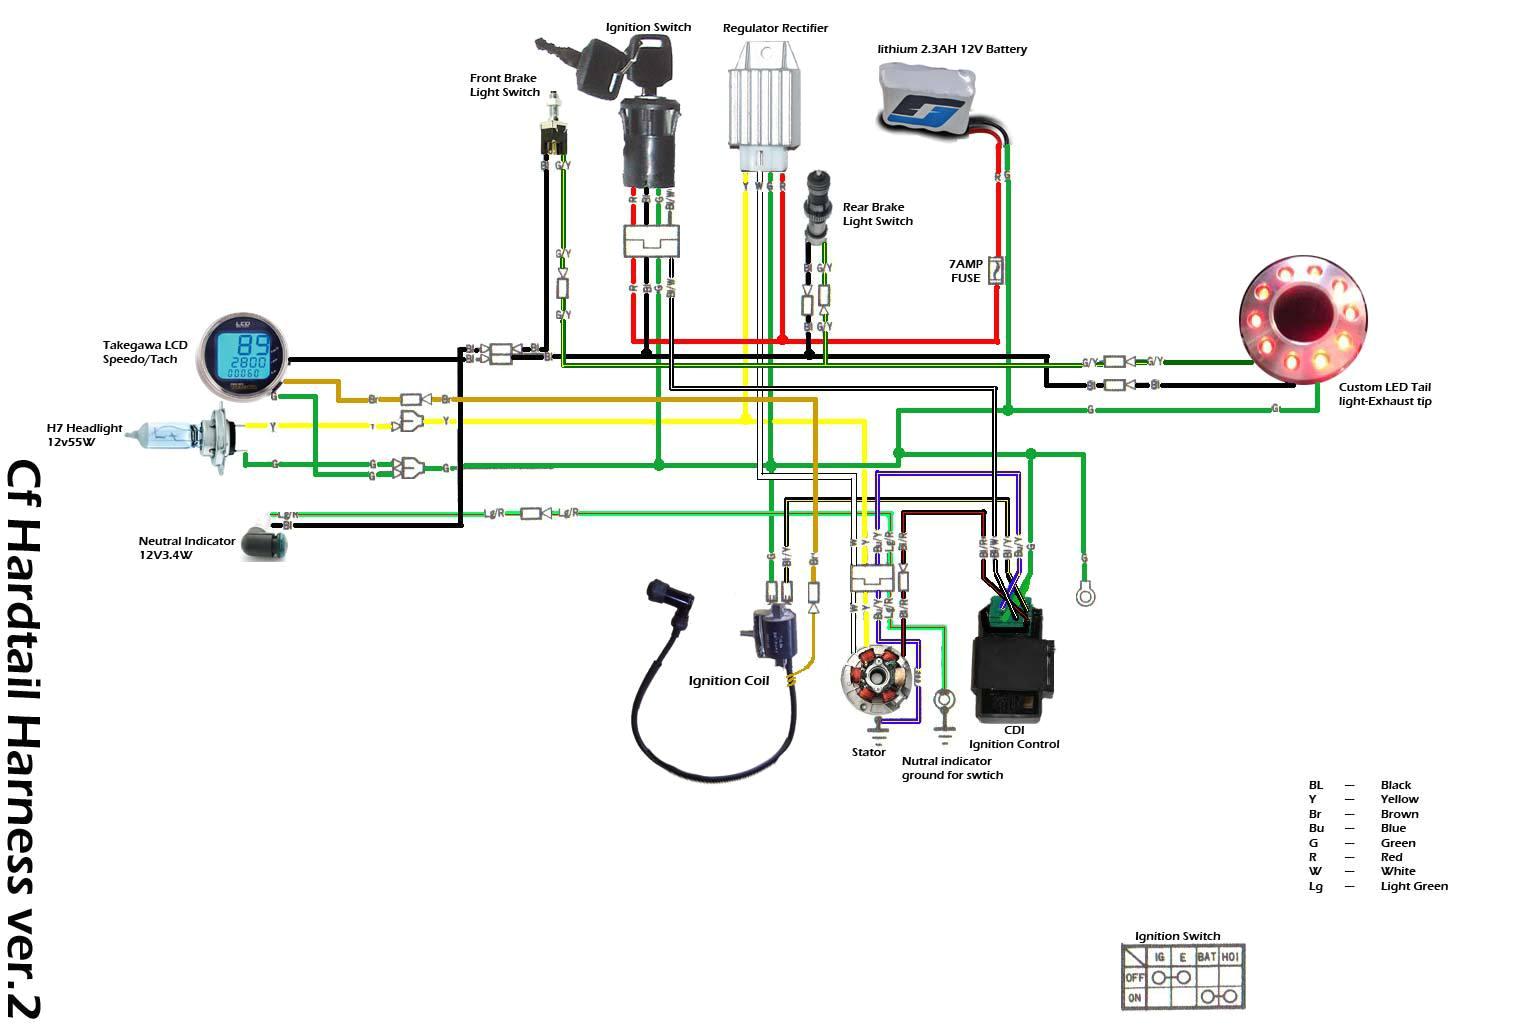 wiring diagram 125cc avt wiring diagram toolbox 125cc taotao atv wiring diagram 125cc atv wiring diagram